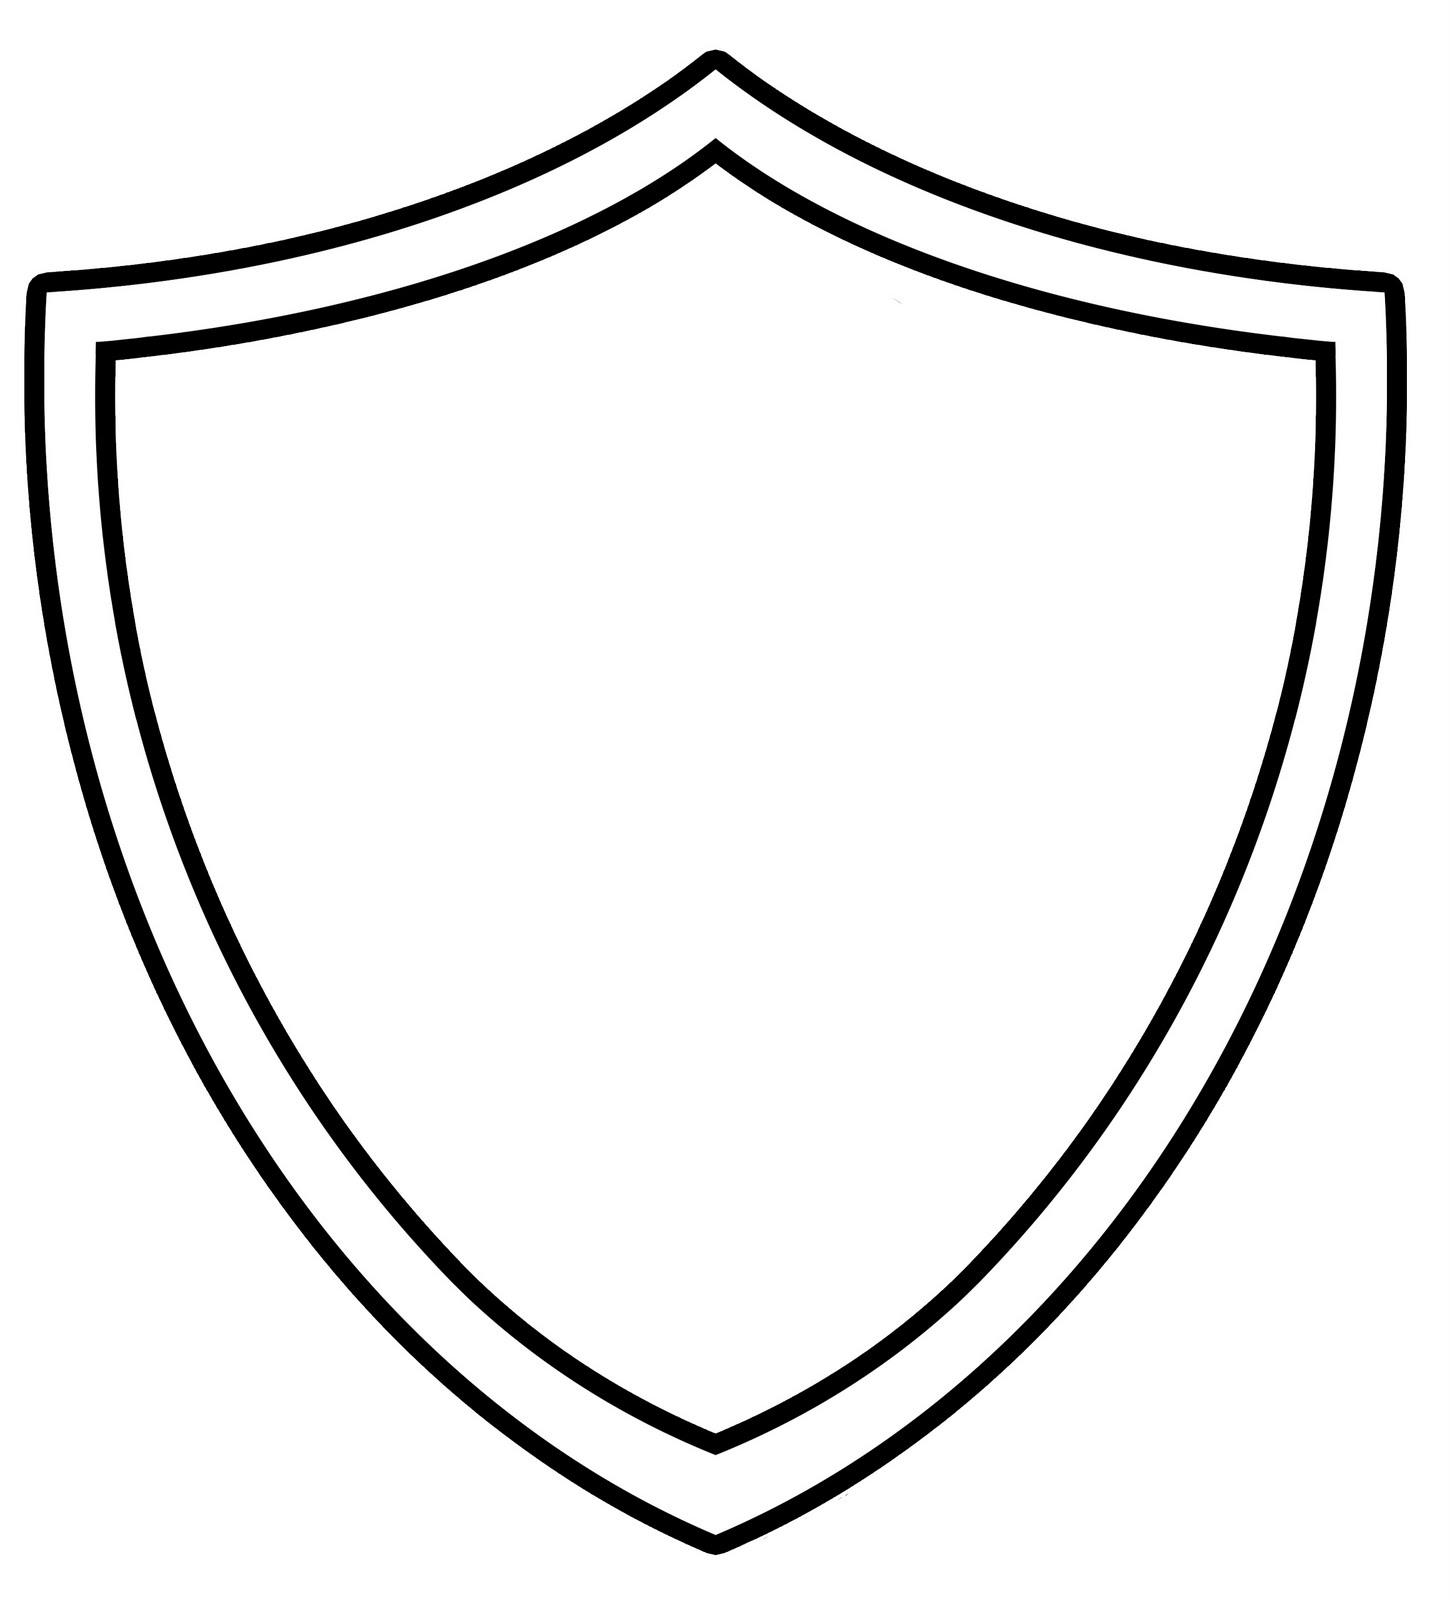 Free Shields Download Free Clip Art Free Clip Art On